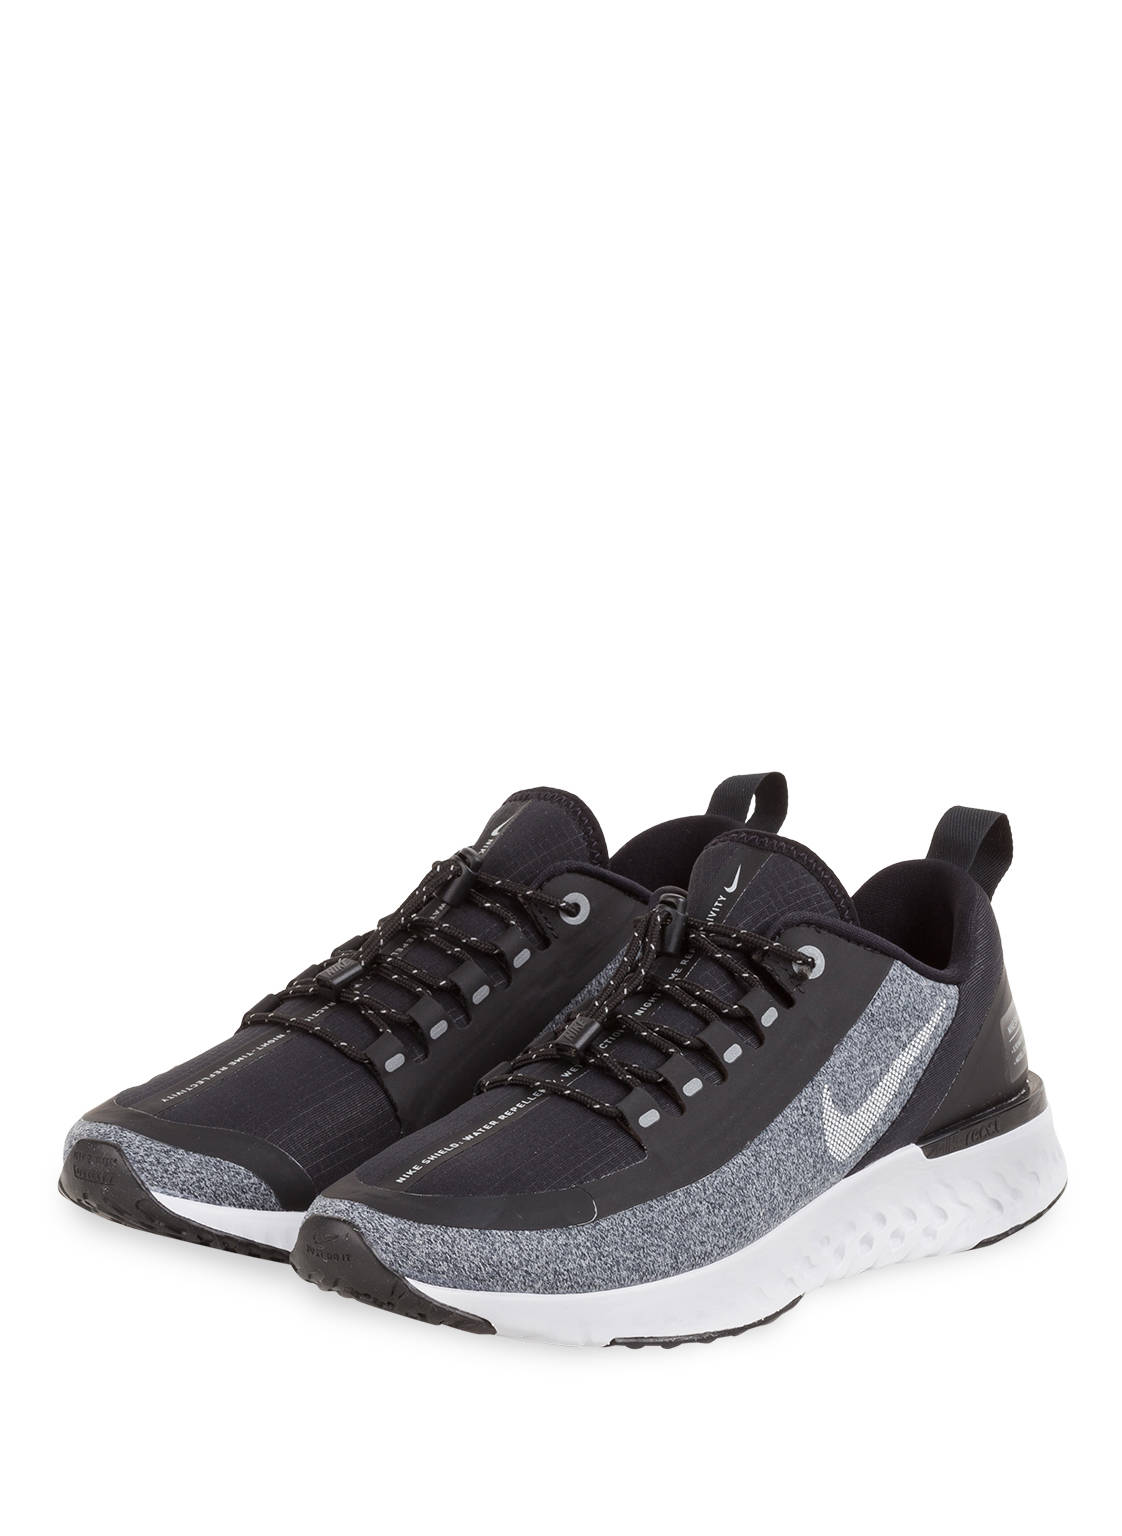 Nike Laufschuhe ODYSSEY REACT SHIELD